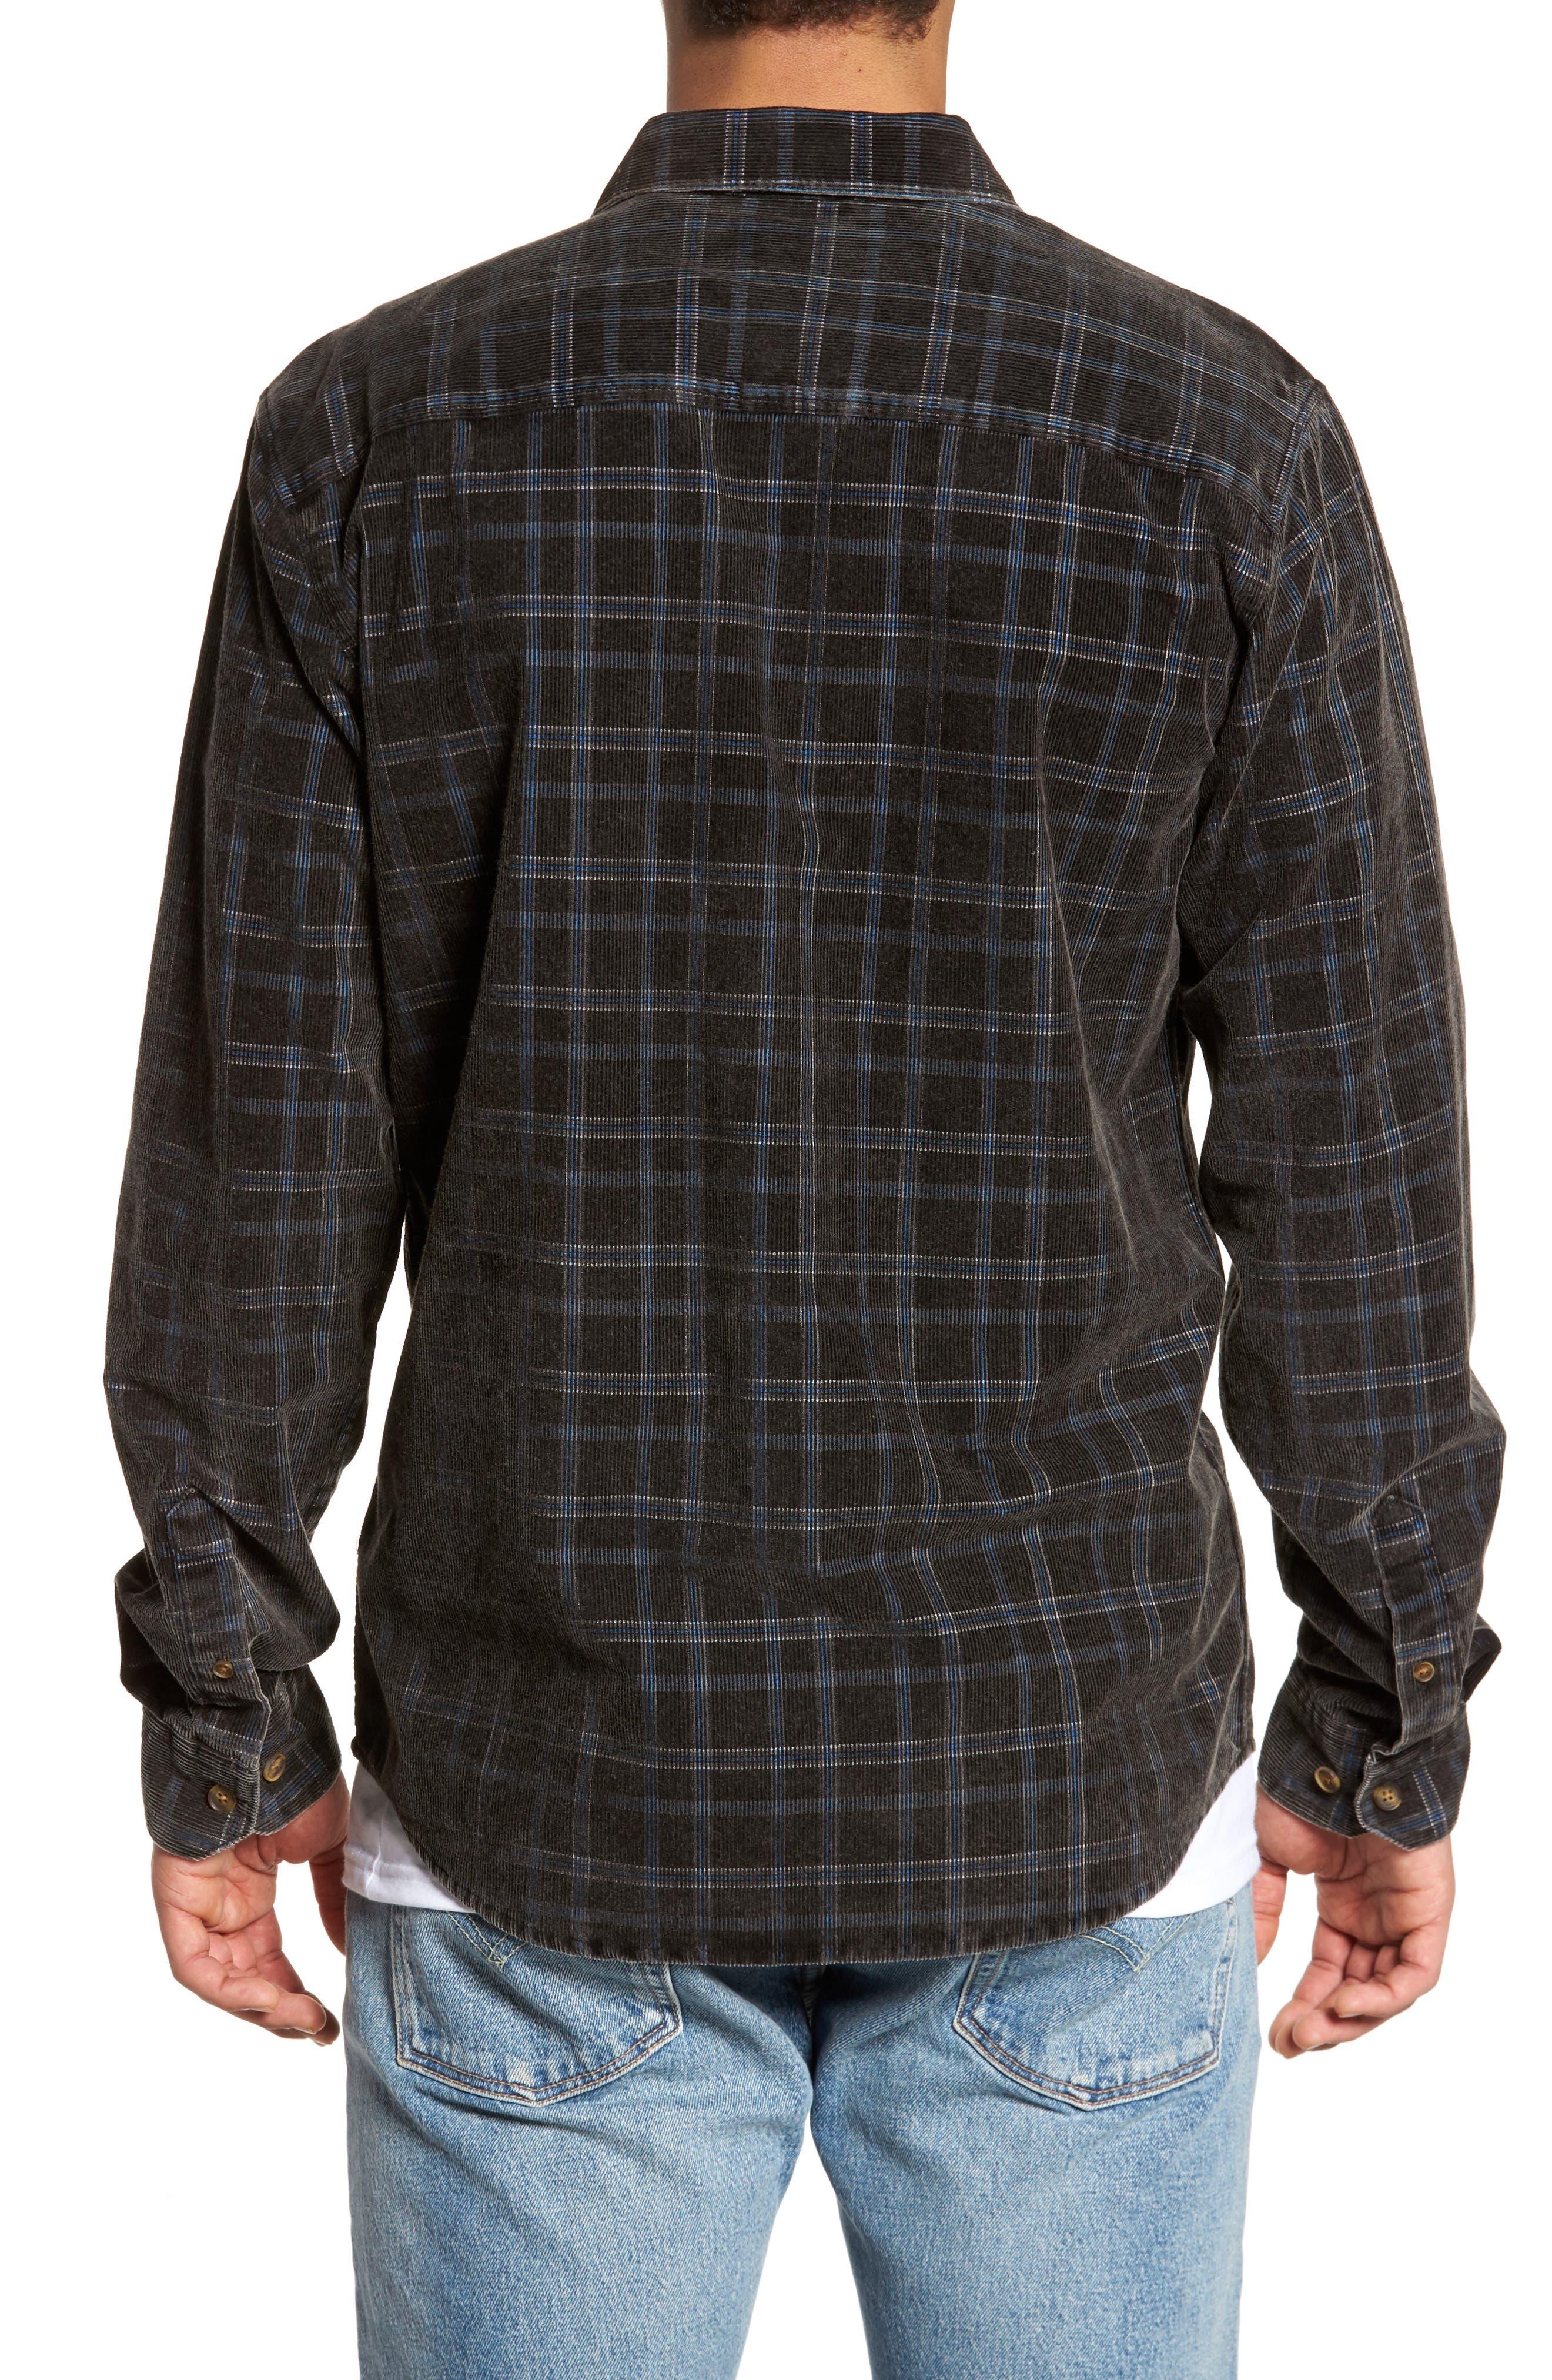 Bradley Corduroy Shirt,                             Alternate thumbnail 2, color,                             001